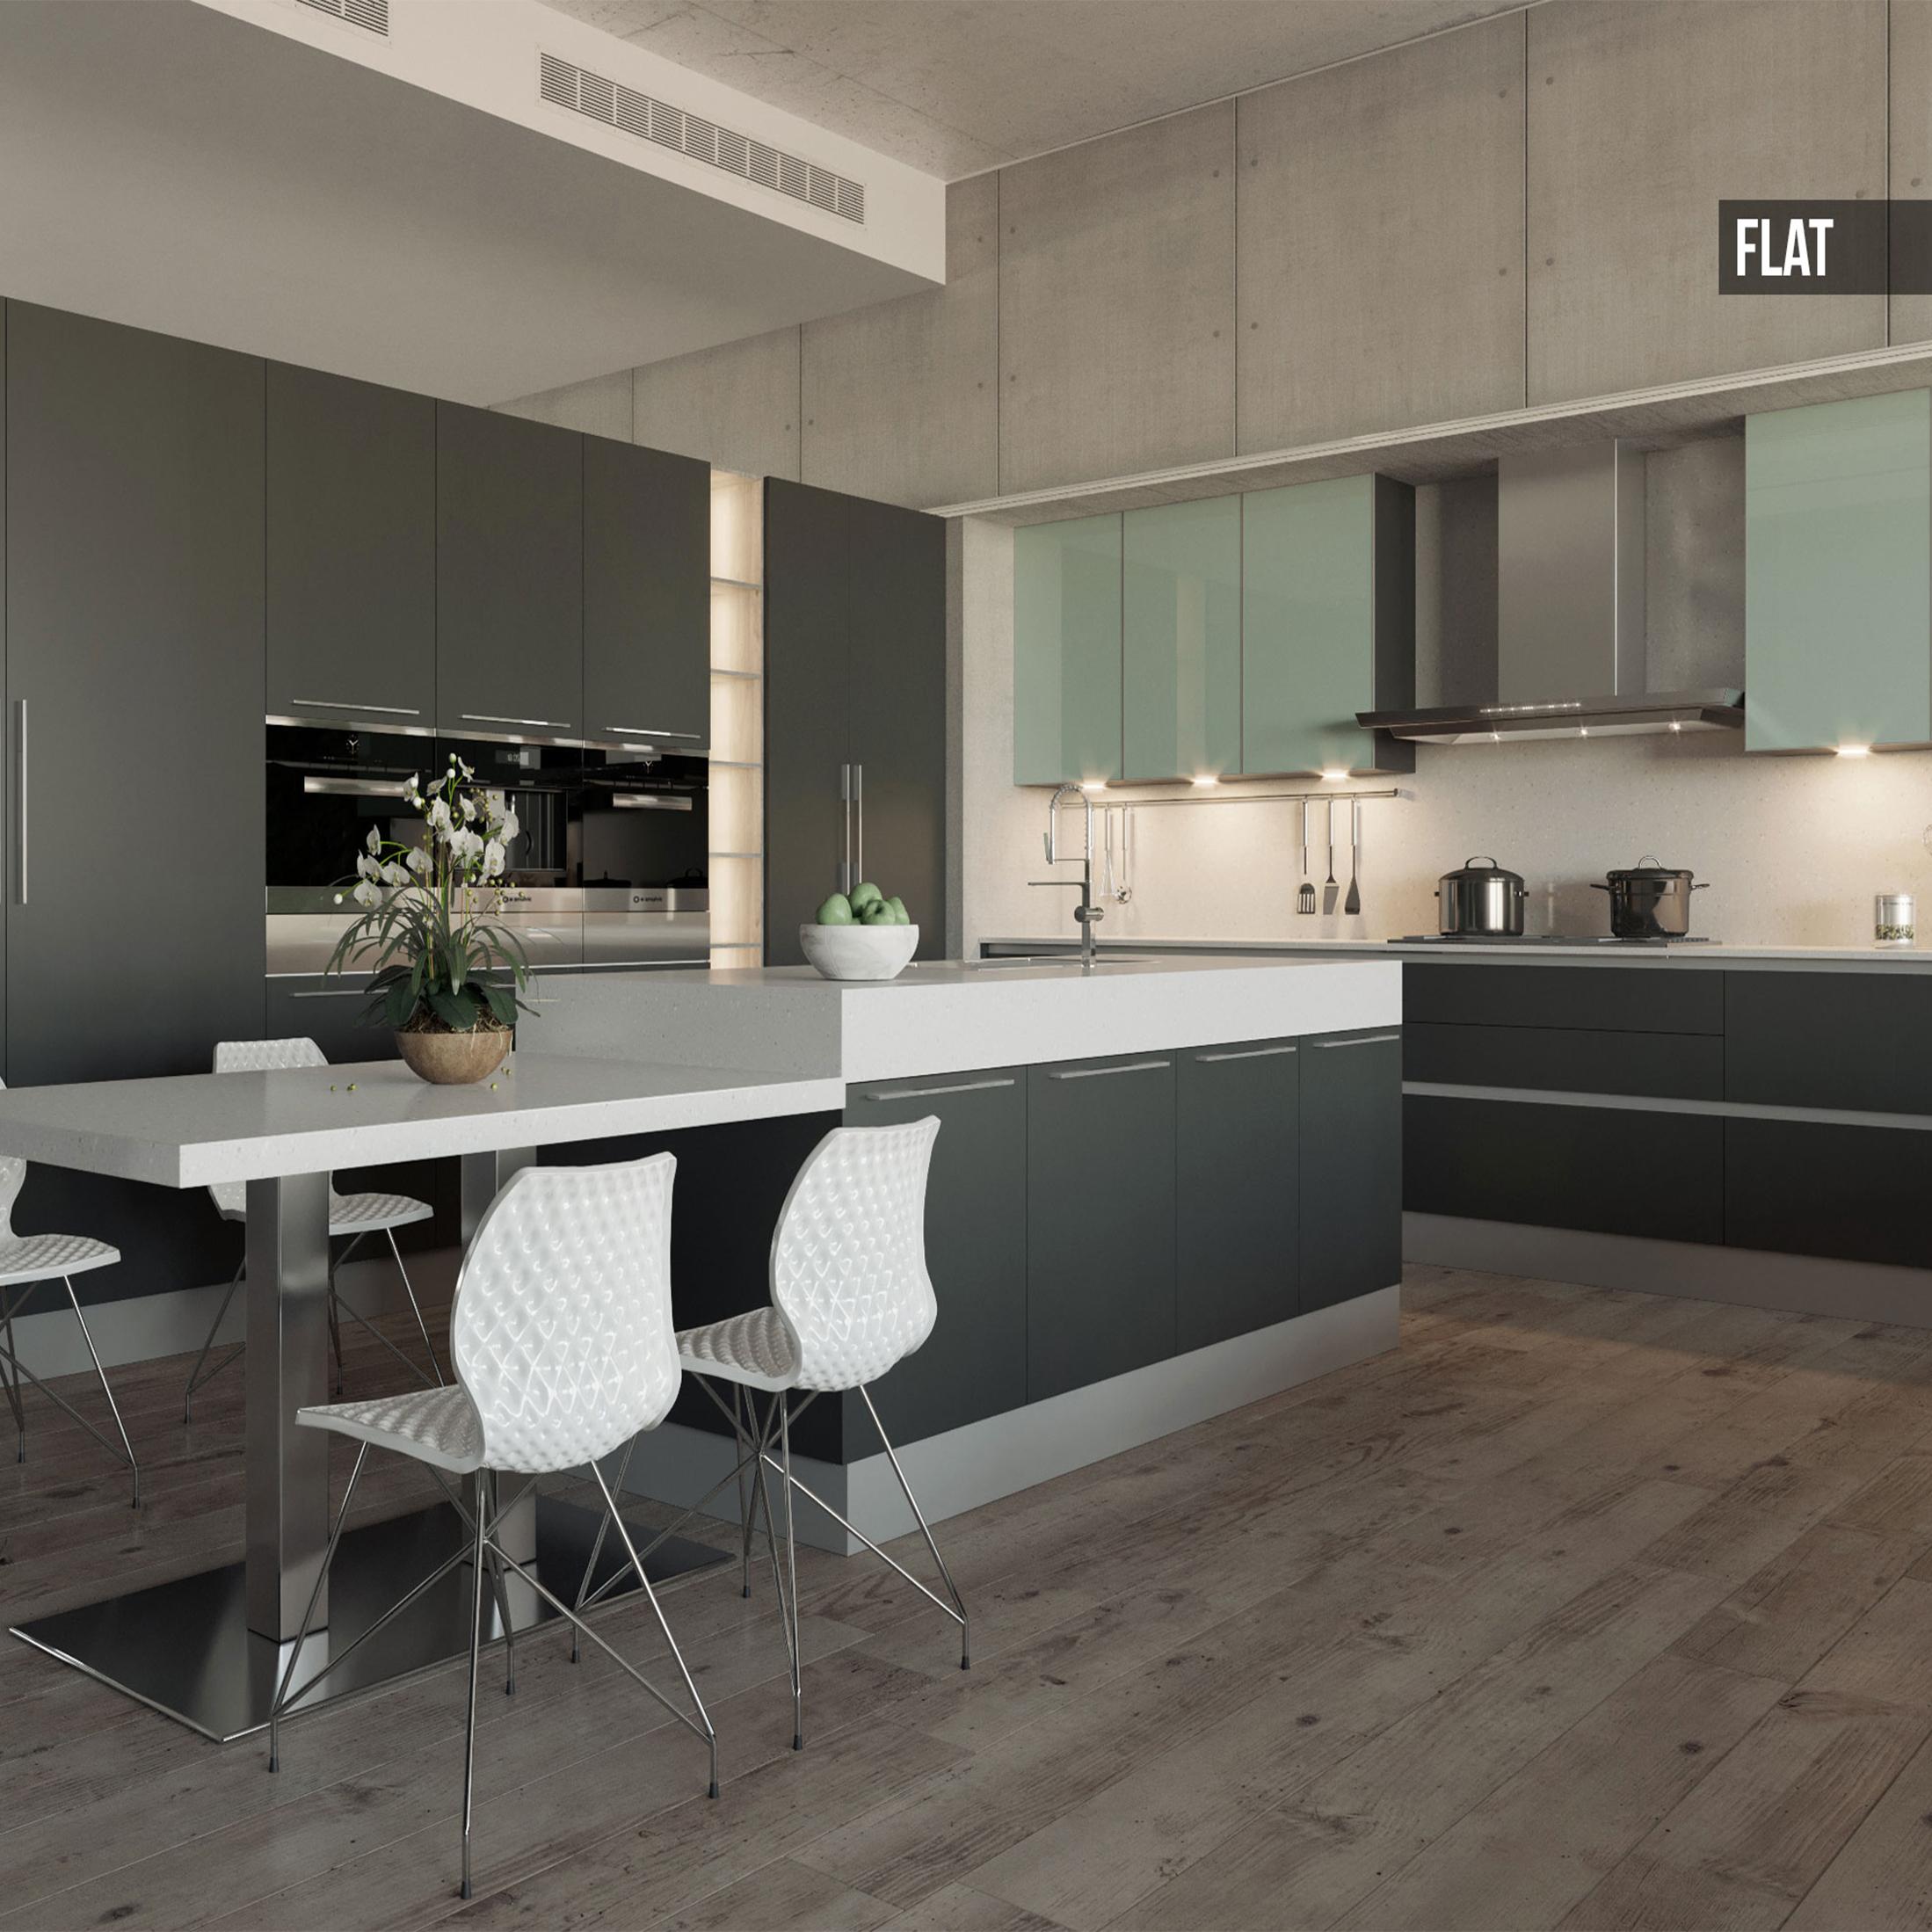 Kafco Aluminum Kitchen -   FLat